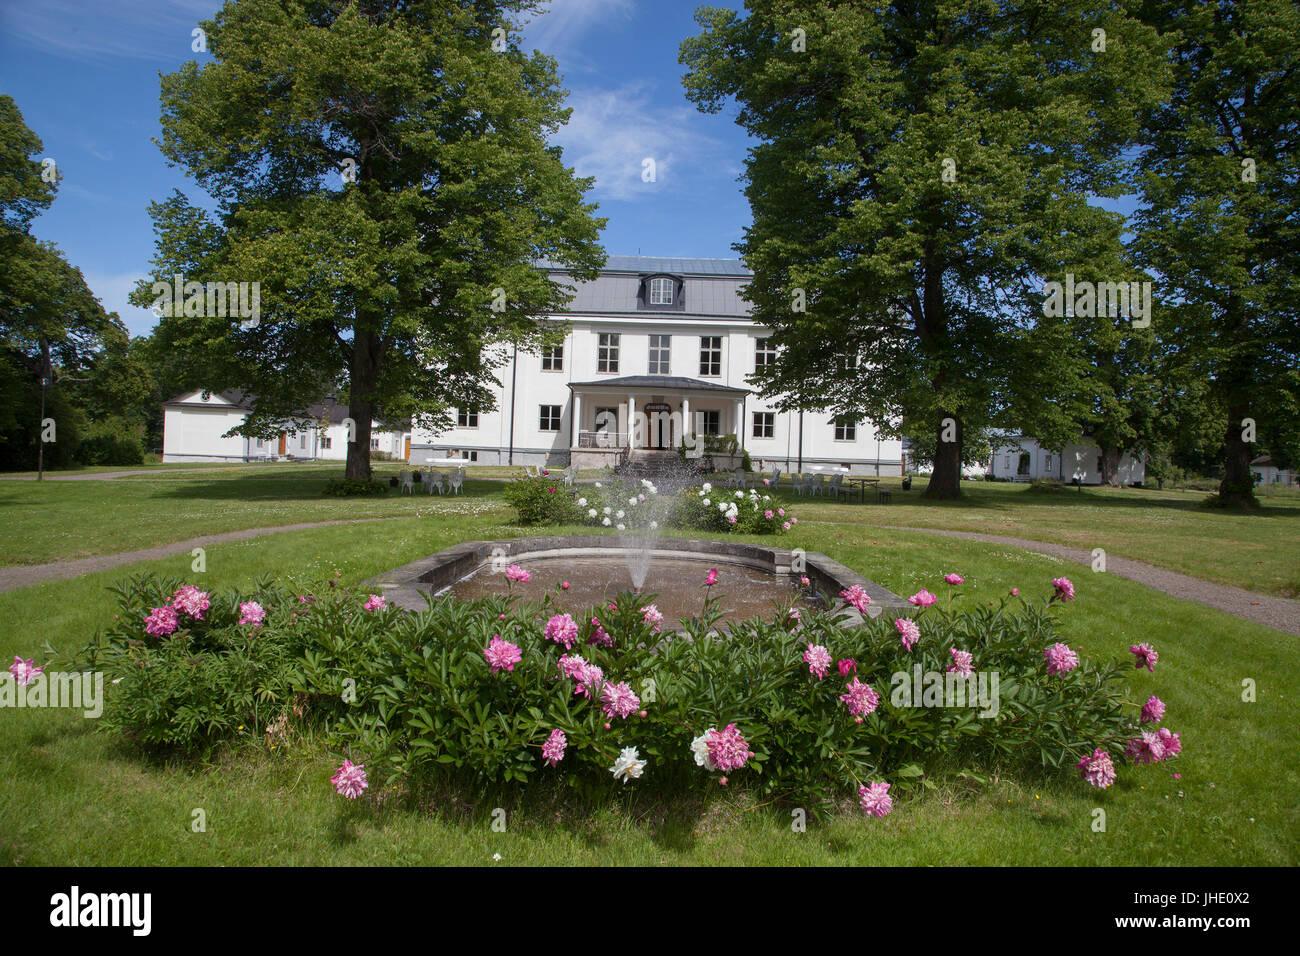 STJÄRNSUND Dalarna Sweden Stock Photo